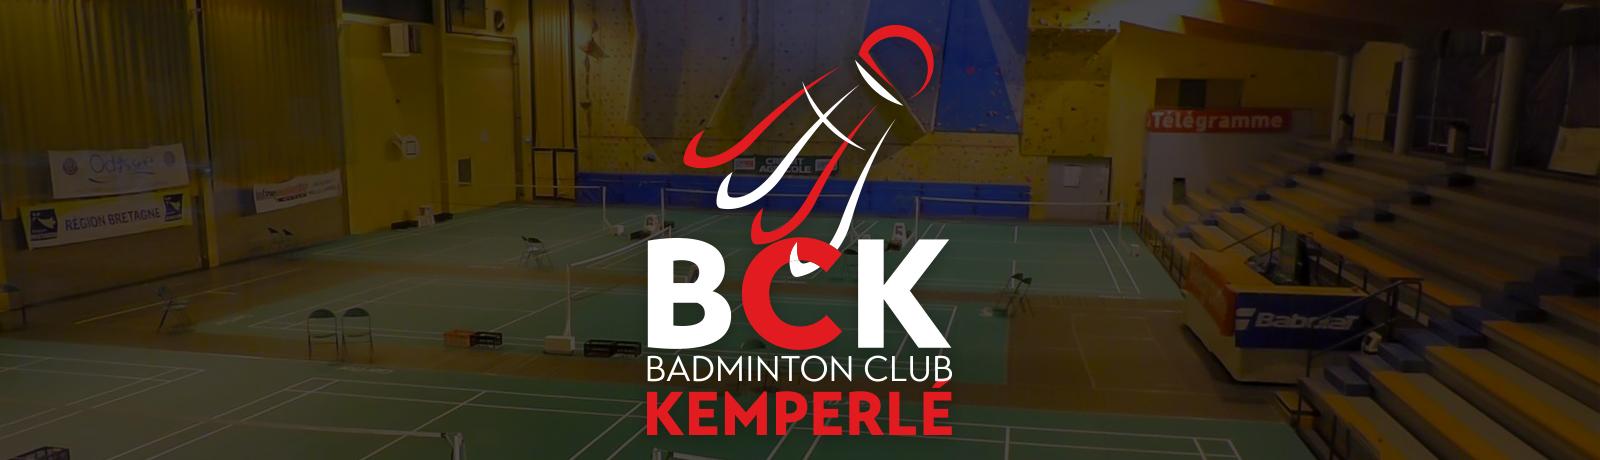 Badminton Club Kemperle